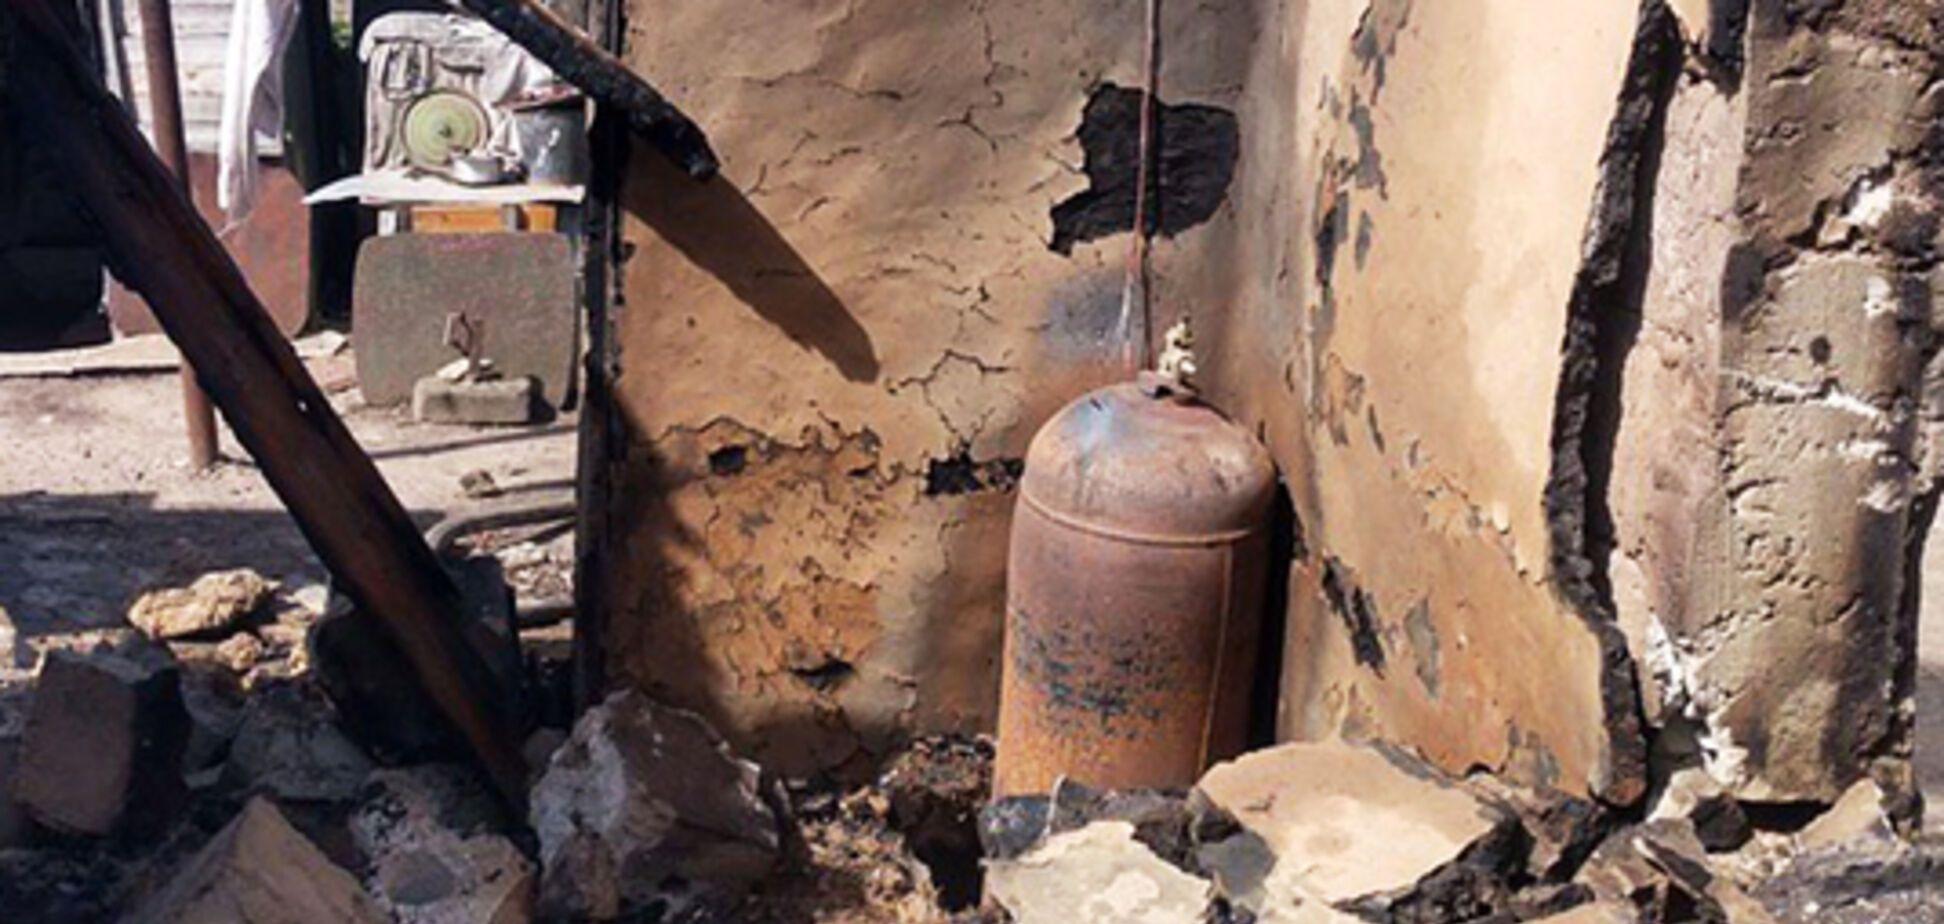 На Днепропетровщине во время пожара серьезно обгорел мужчина. Фото с места ЧП